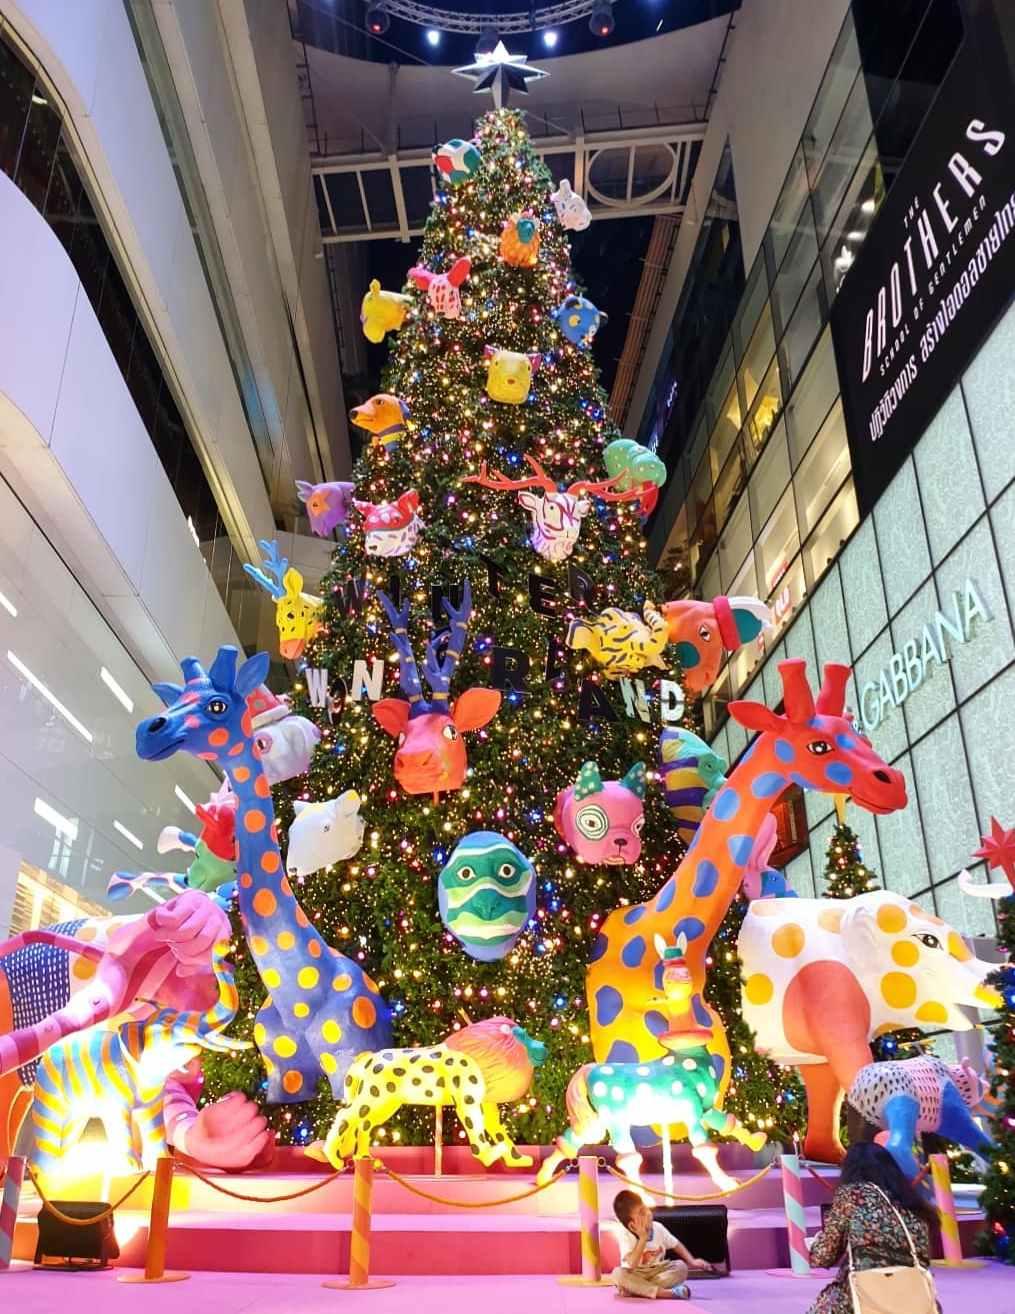 Kerstboom met allemaal gekleurde gekke dierenkoppen erin